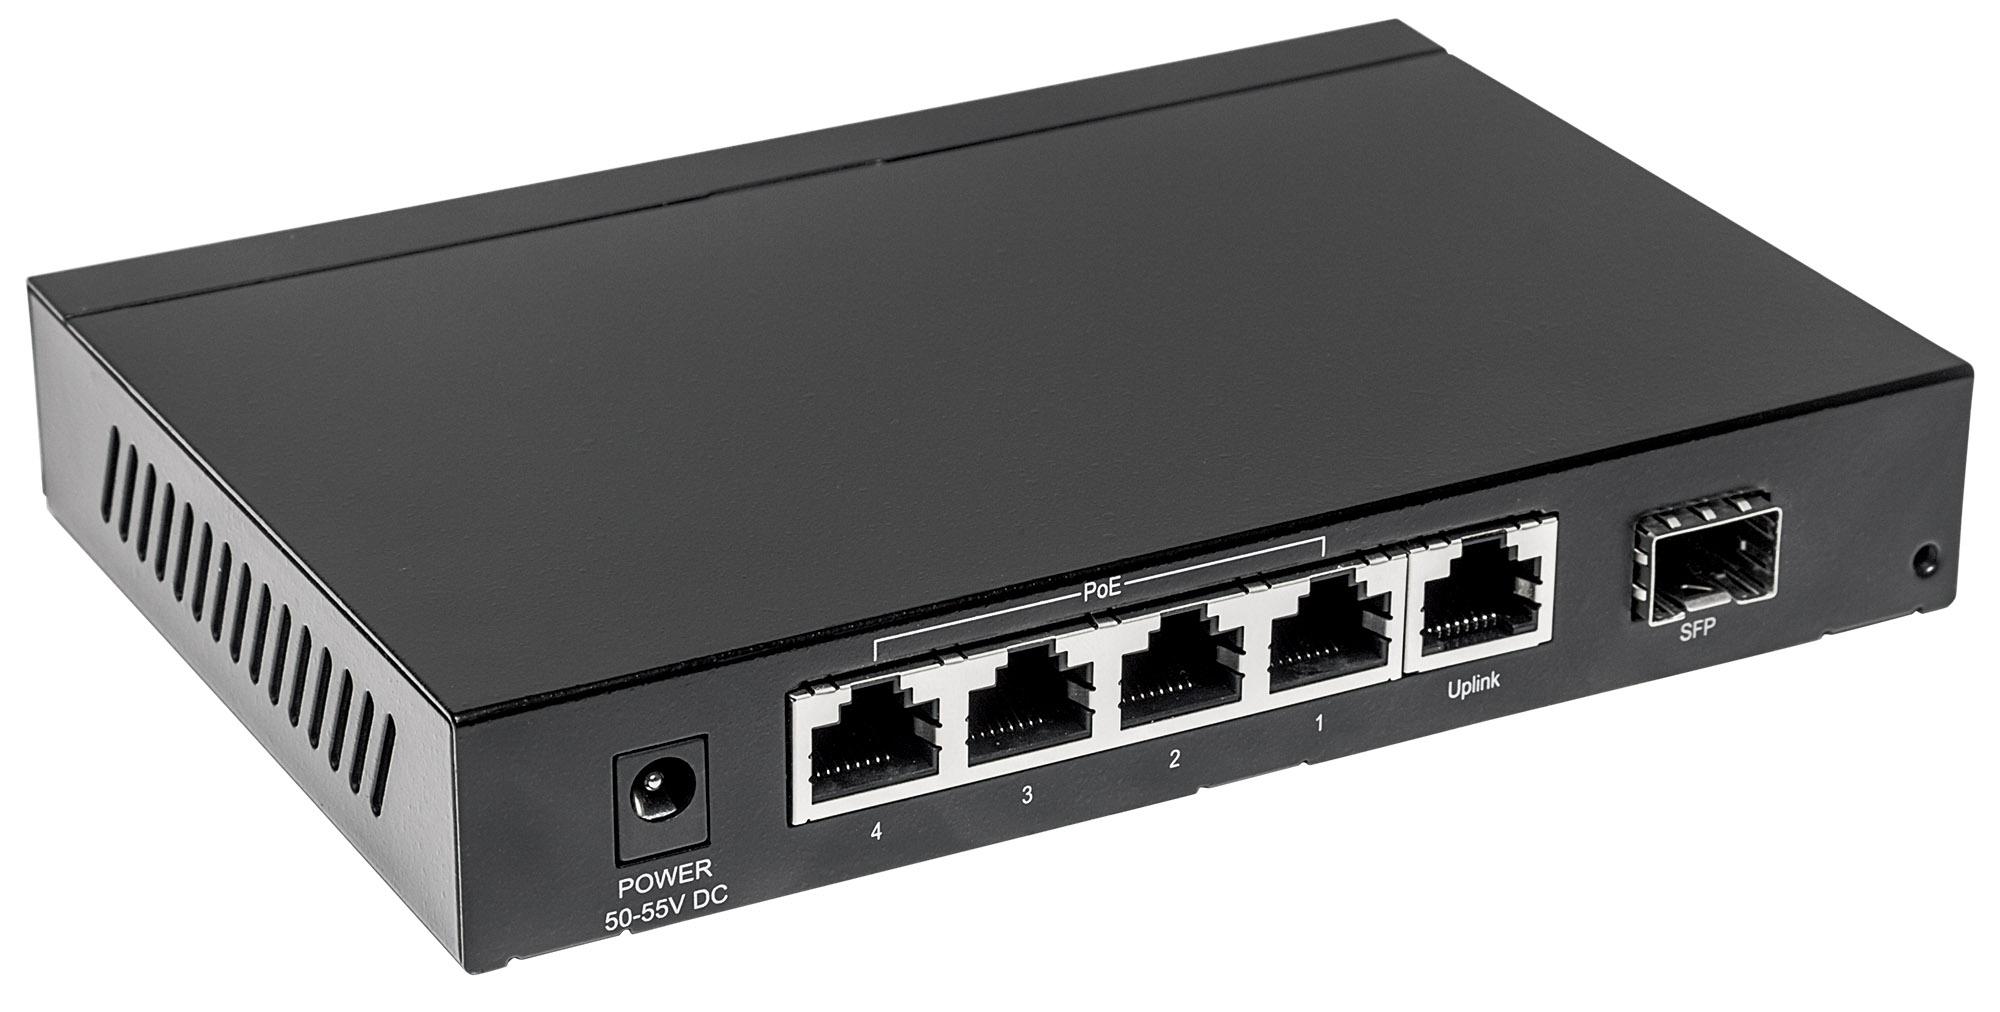 5-Port Gigabit Ethernet PoE+ Switch with SFP Combo Port